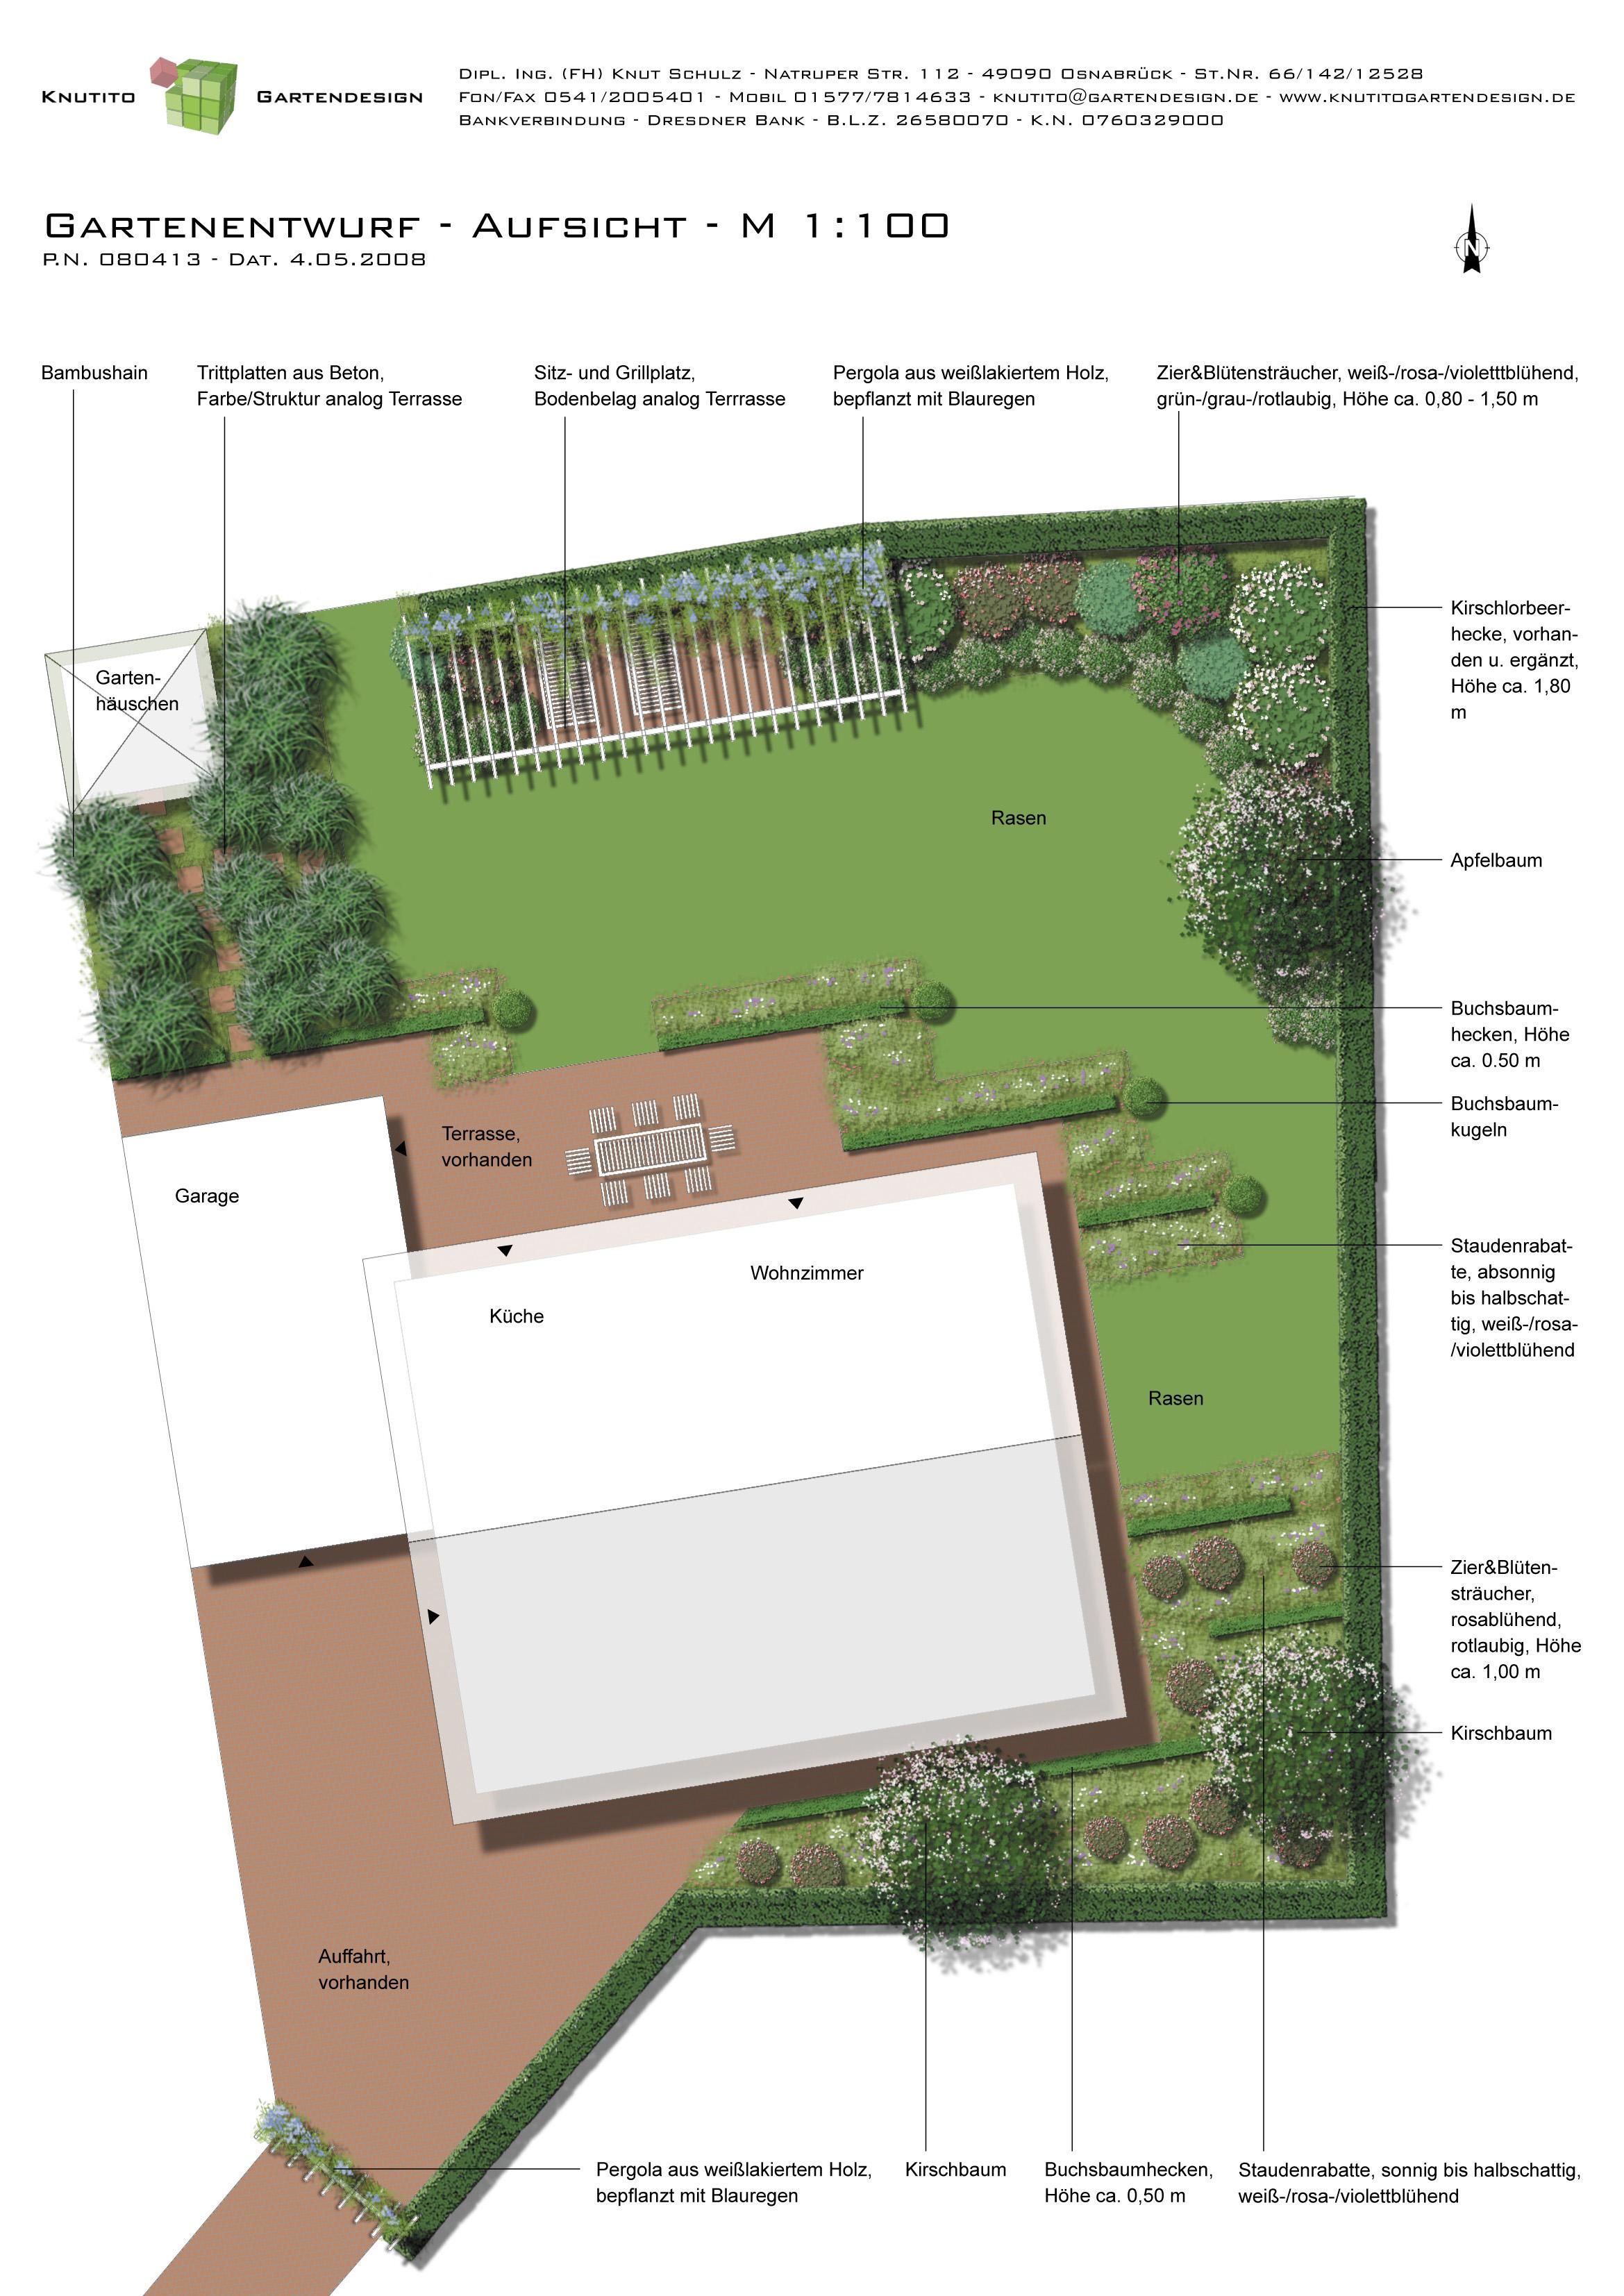 Knutito Gartendesign Referenzen Planung 2008 Privatgarten Engter